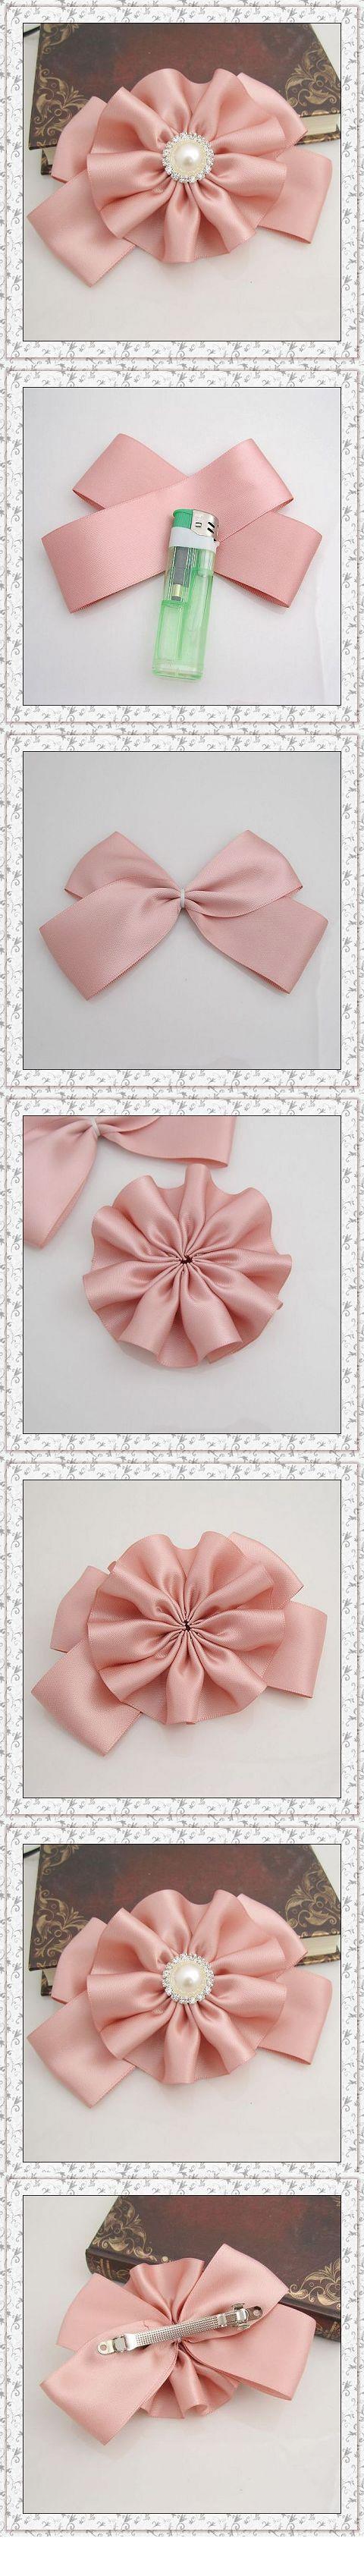 Handmade bow tutorial.